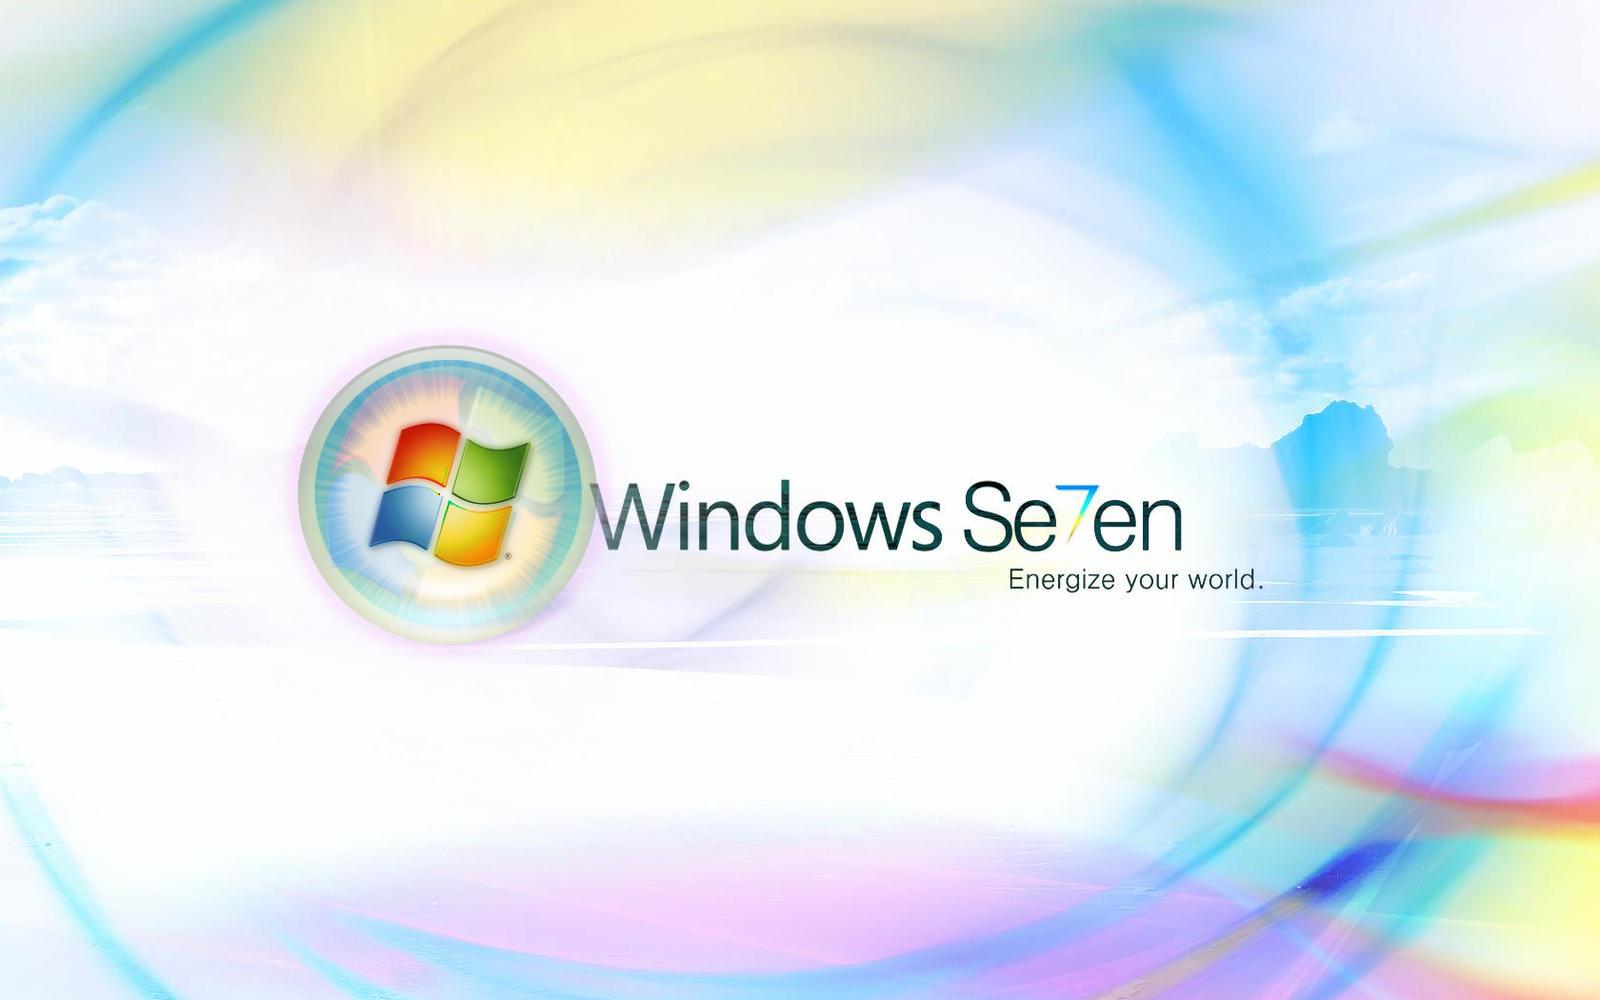 Windows rg edition - Win 7 Ori